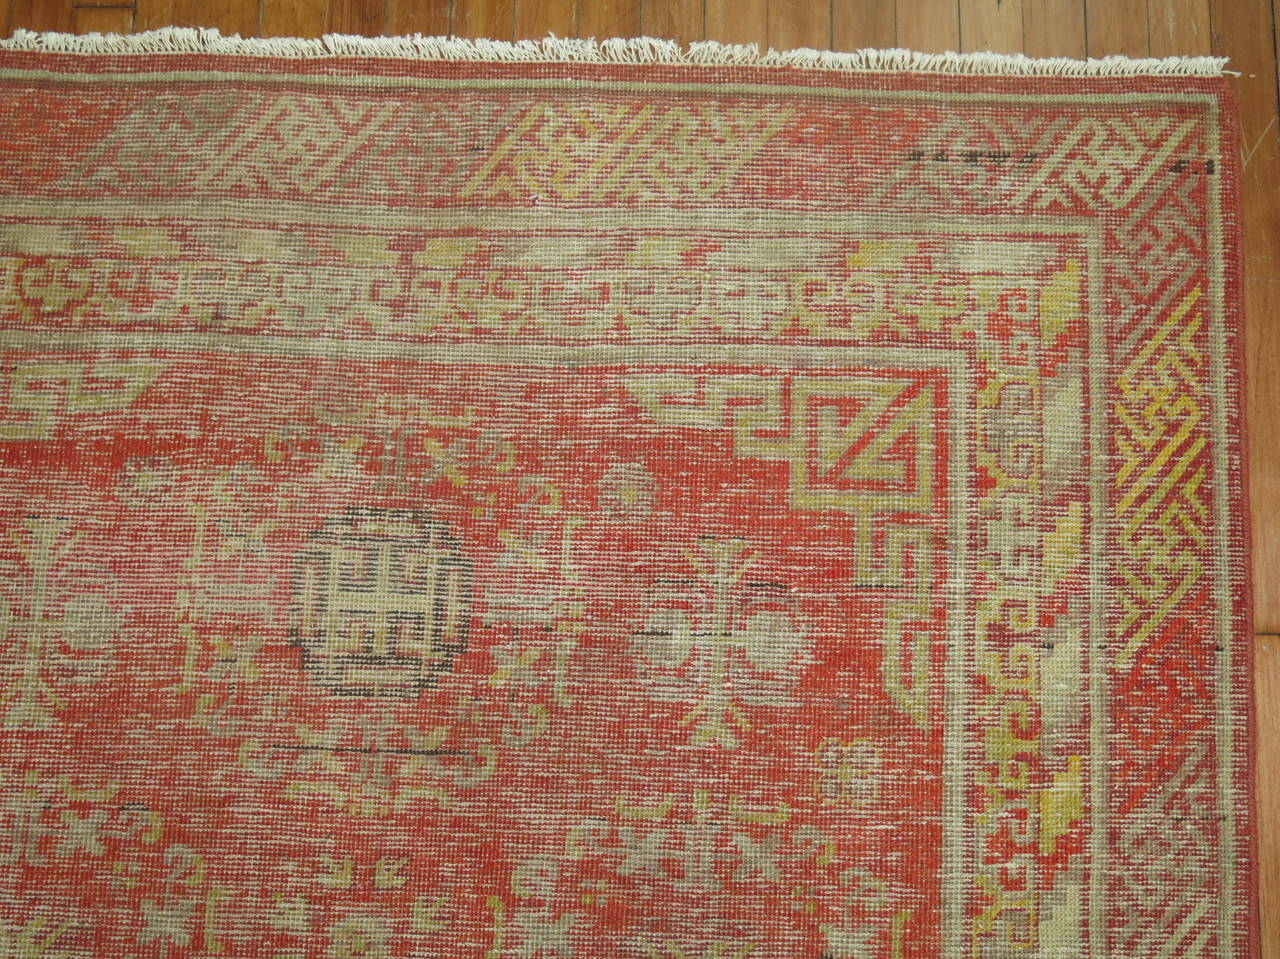 Authentic early 20th century Samarkand Khotan rug.